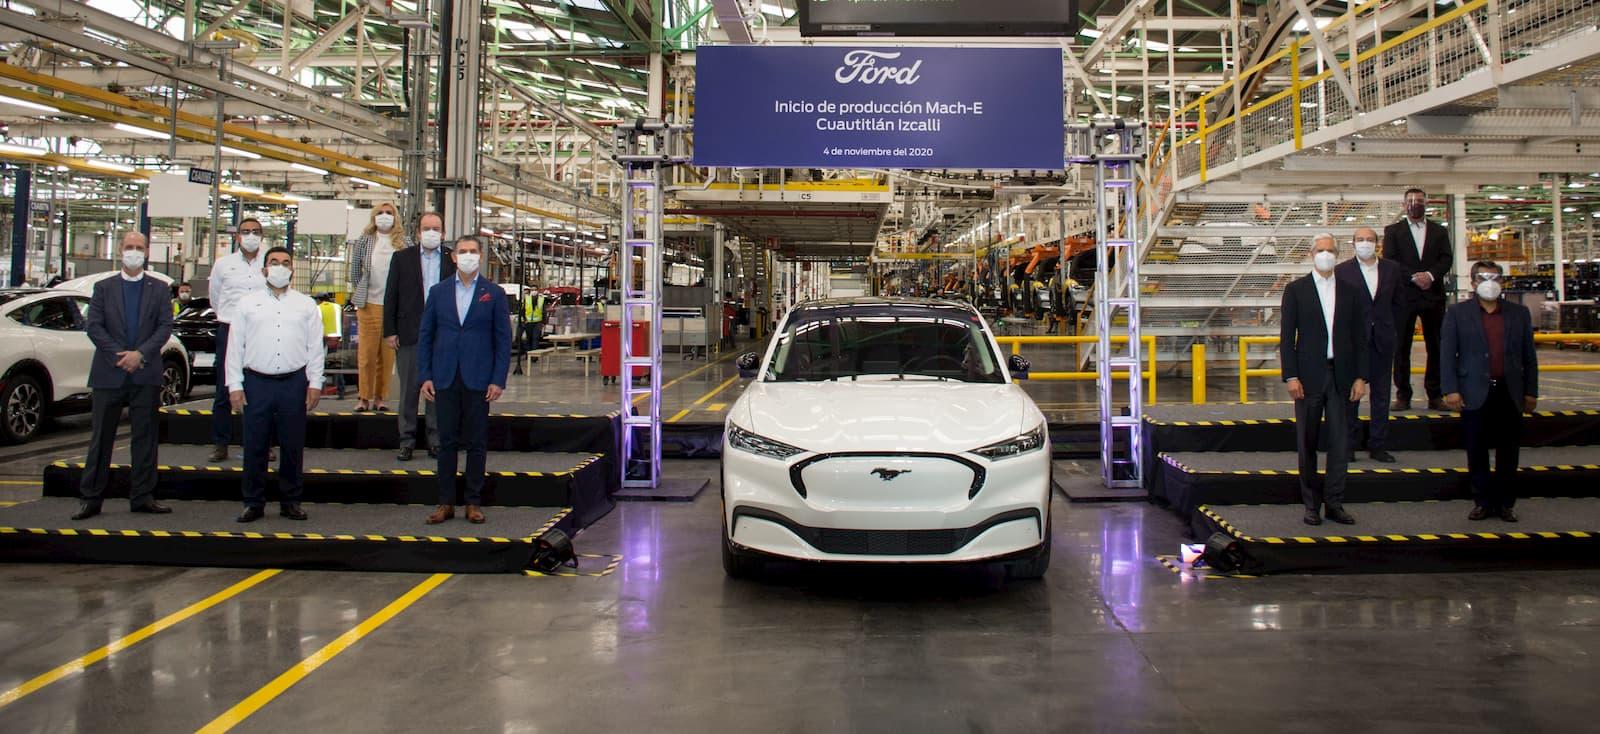 Ford Mustang Mach-E production Cuautitlan Izcalli plant